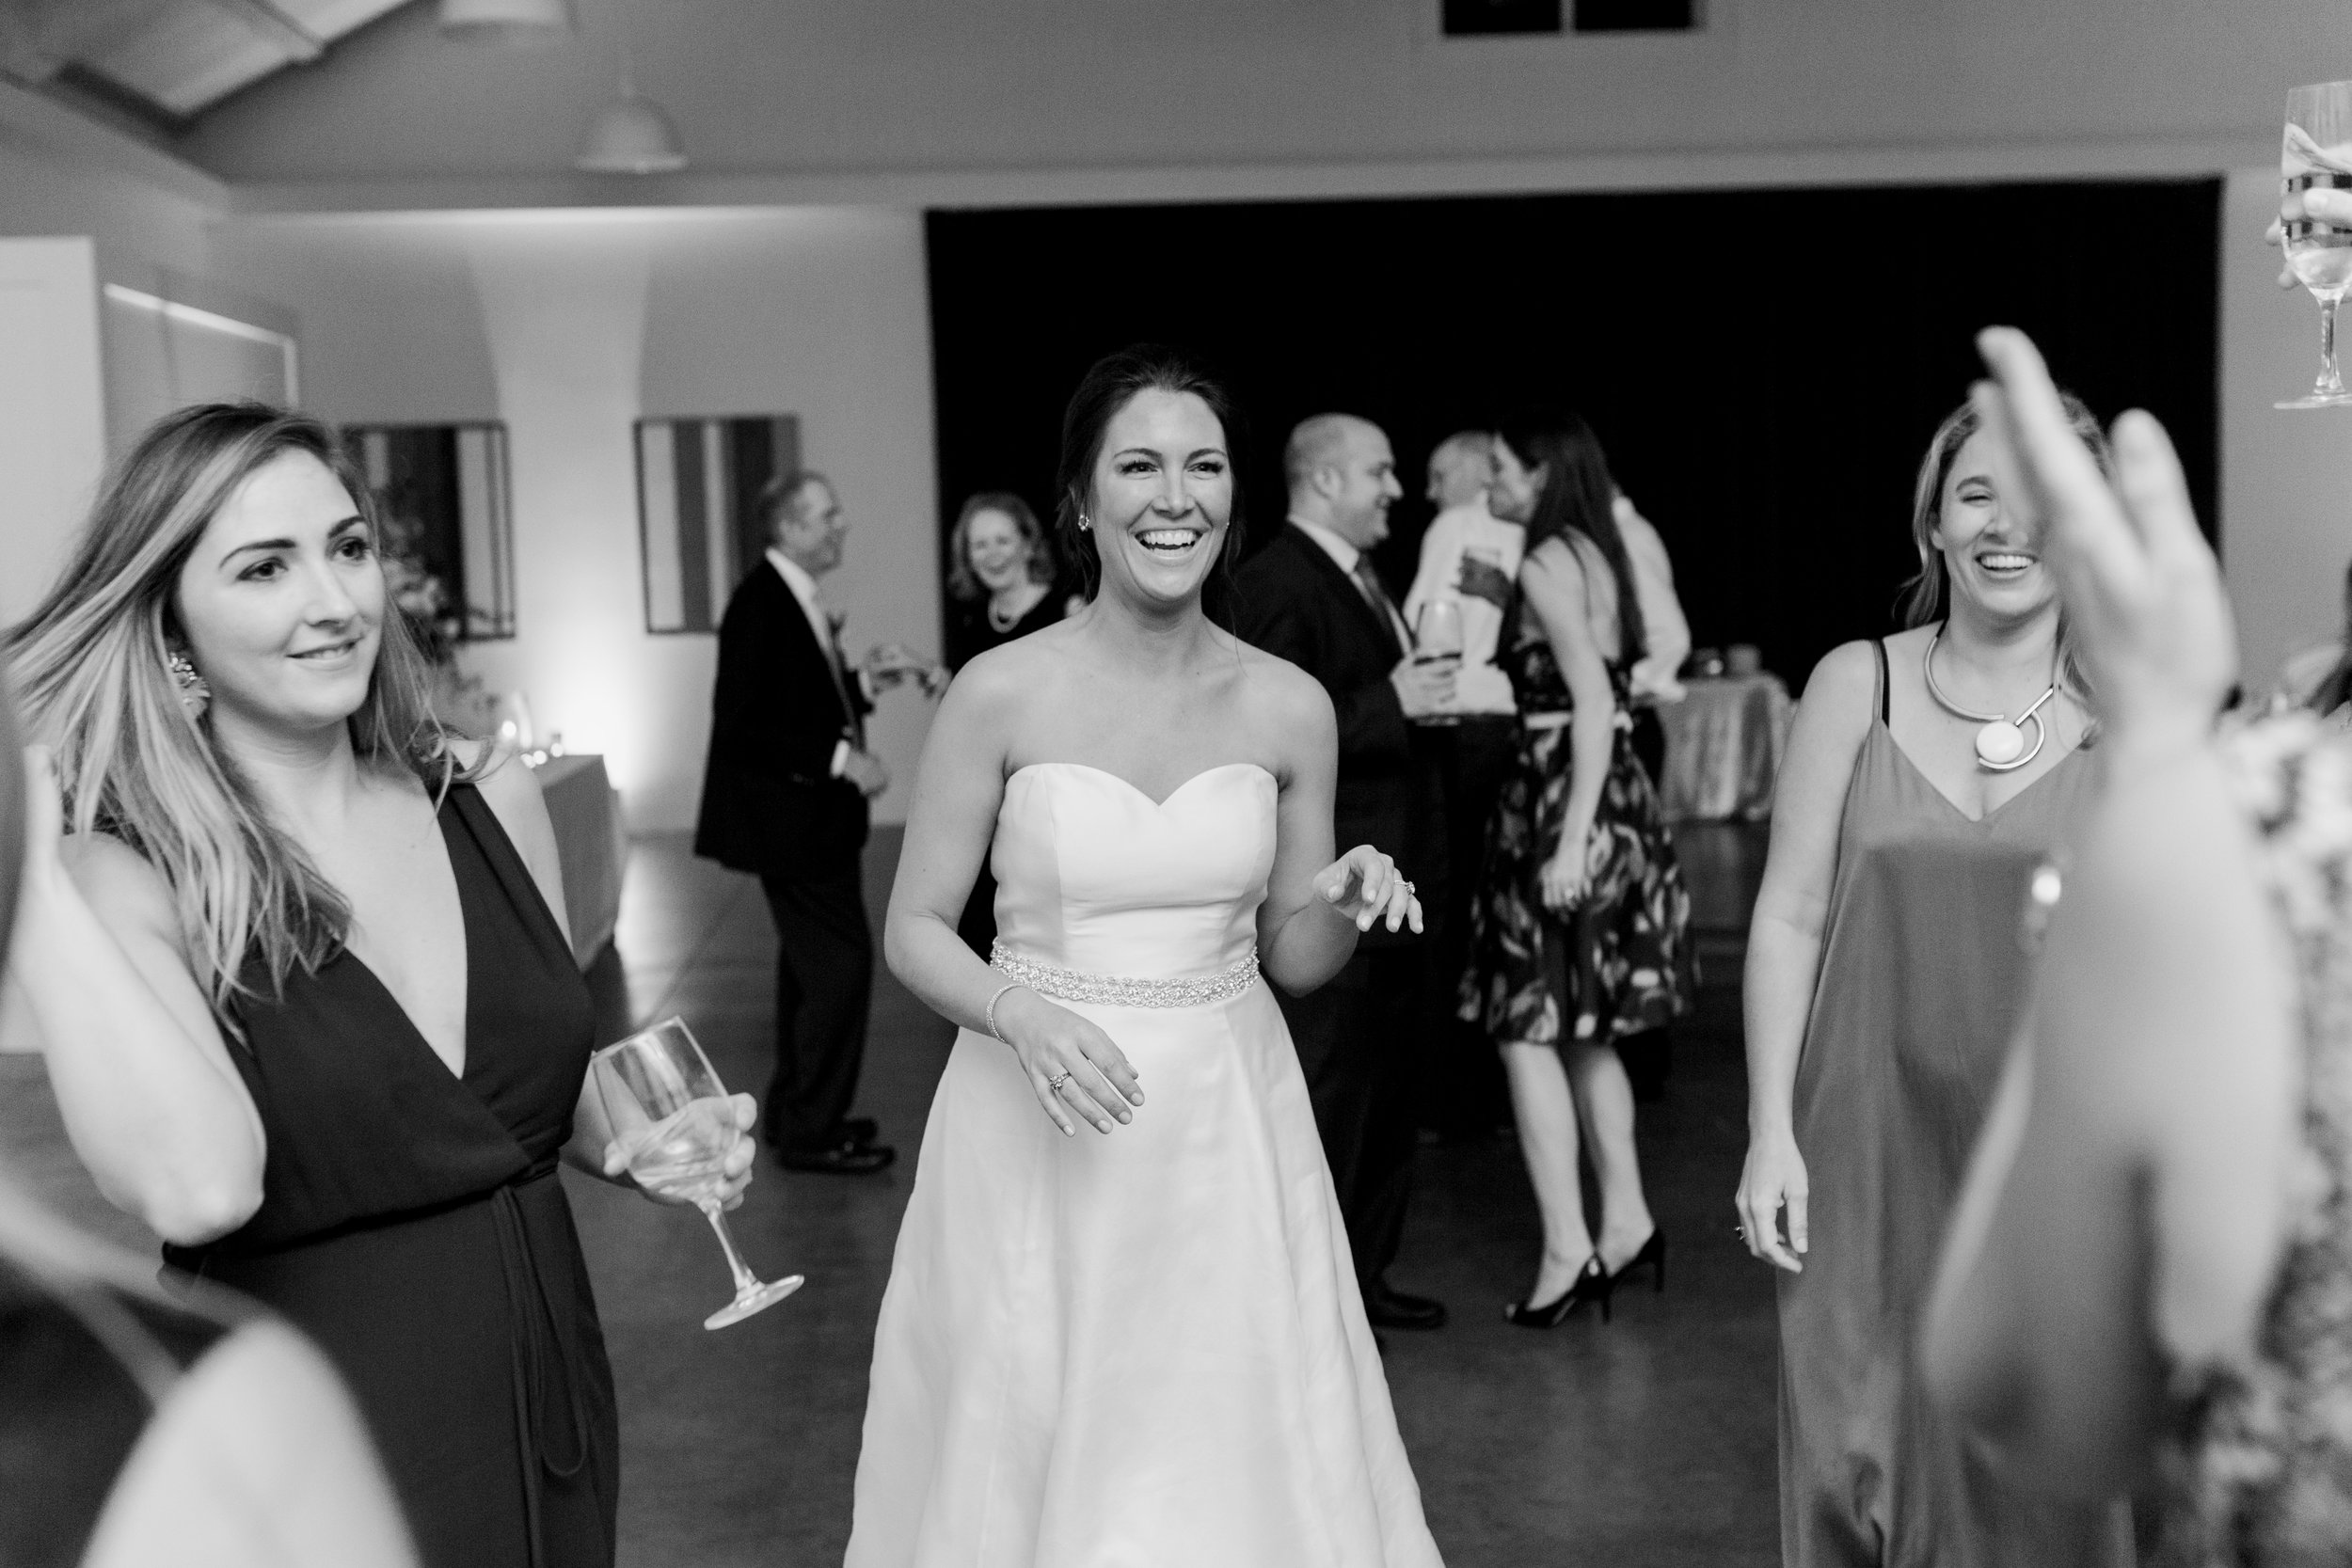 intimate-wedding-at-solage-calistoga-in-napa-123.jpg